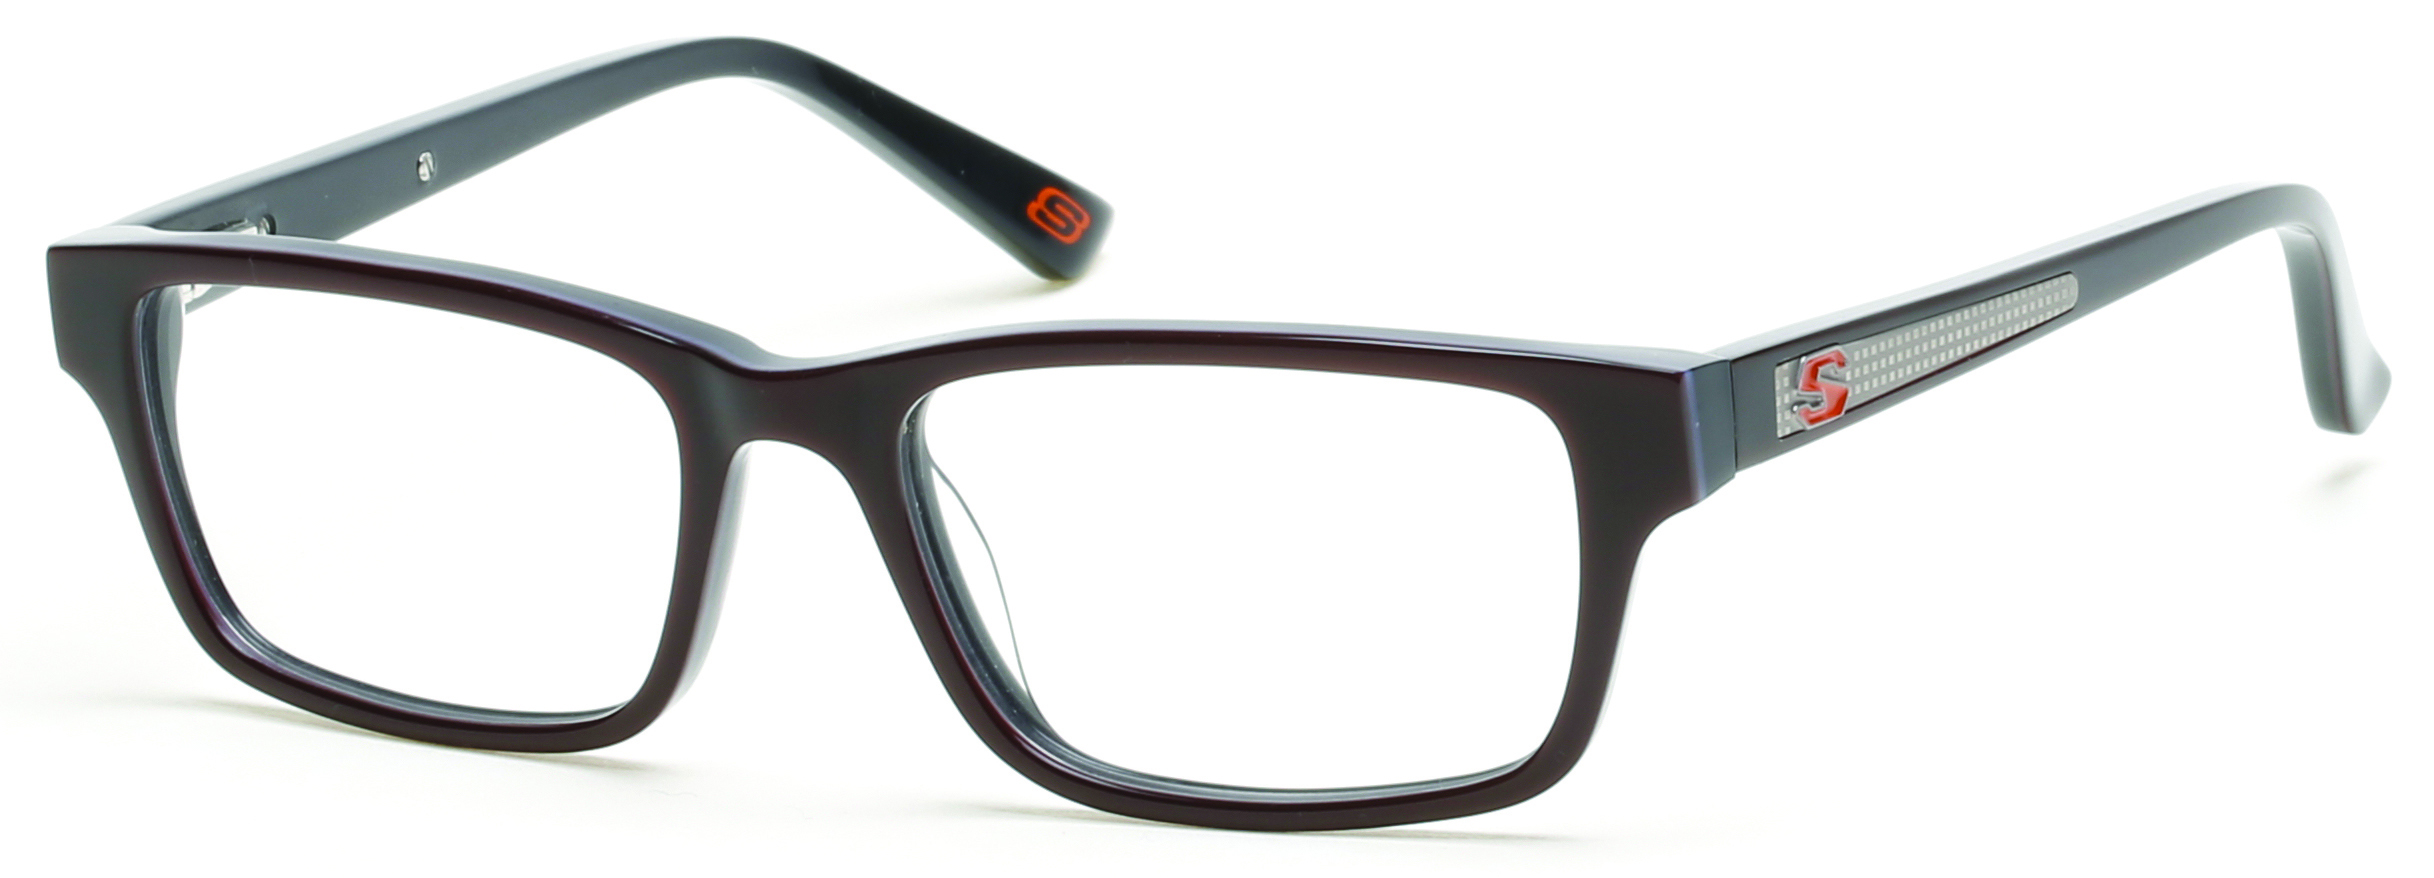 b83beb110a8 Eyewear for Kids - Boy 11-13 years - Optiwow